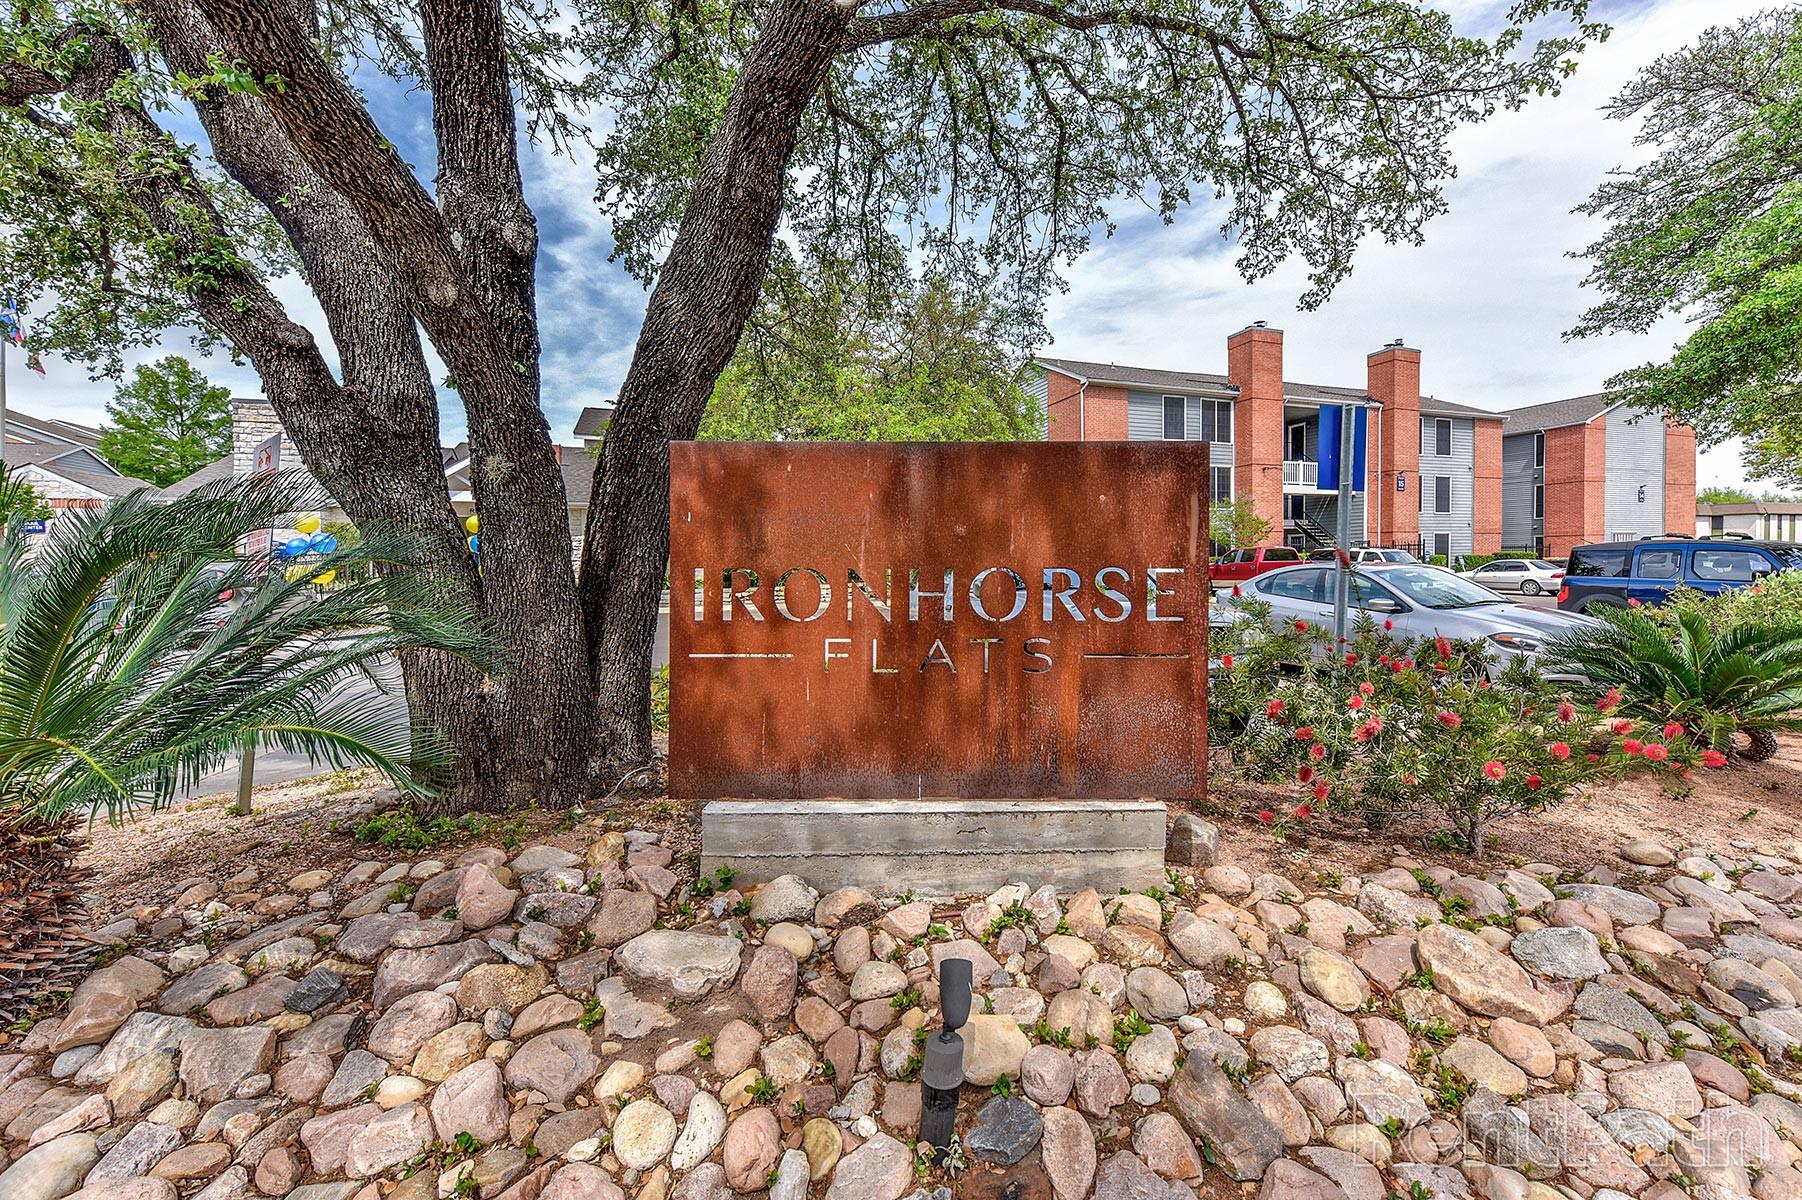 Apartments Near UT Austin Ironhorse Flats Apartments for University of Texas - Austin Students in Austin, TX